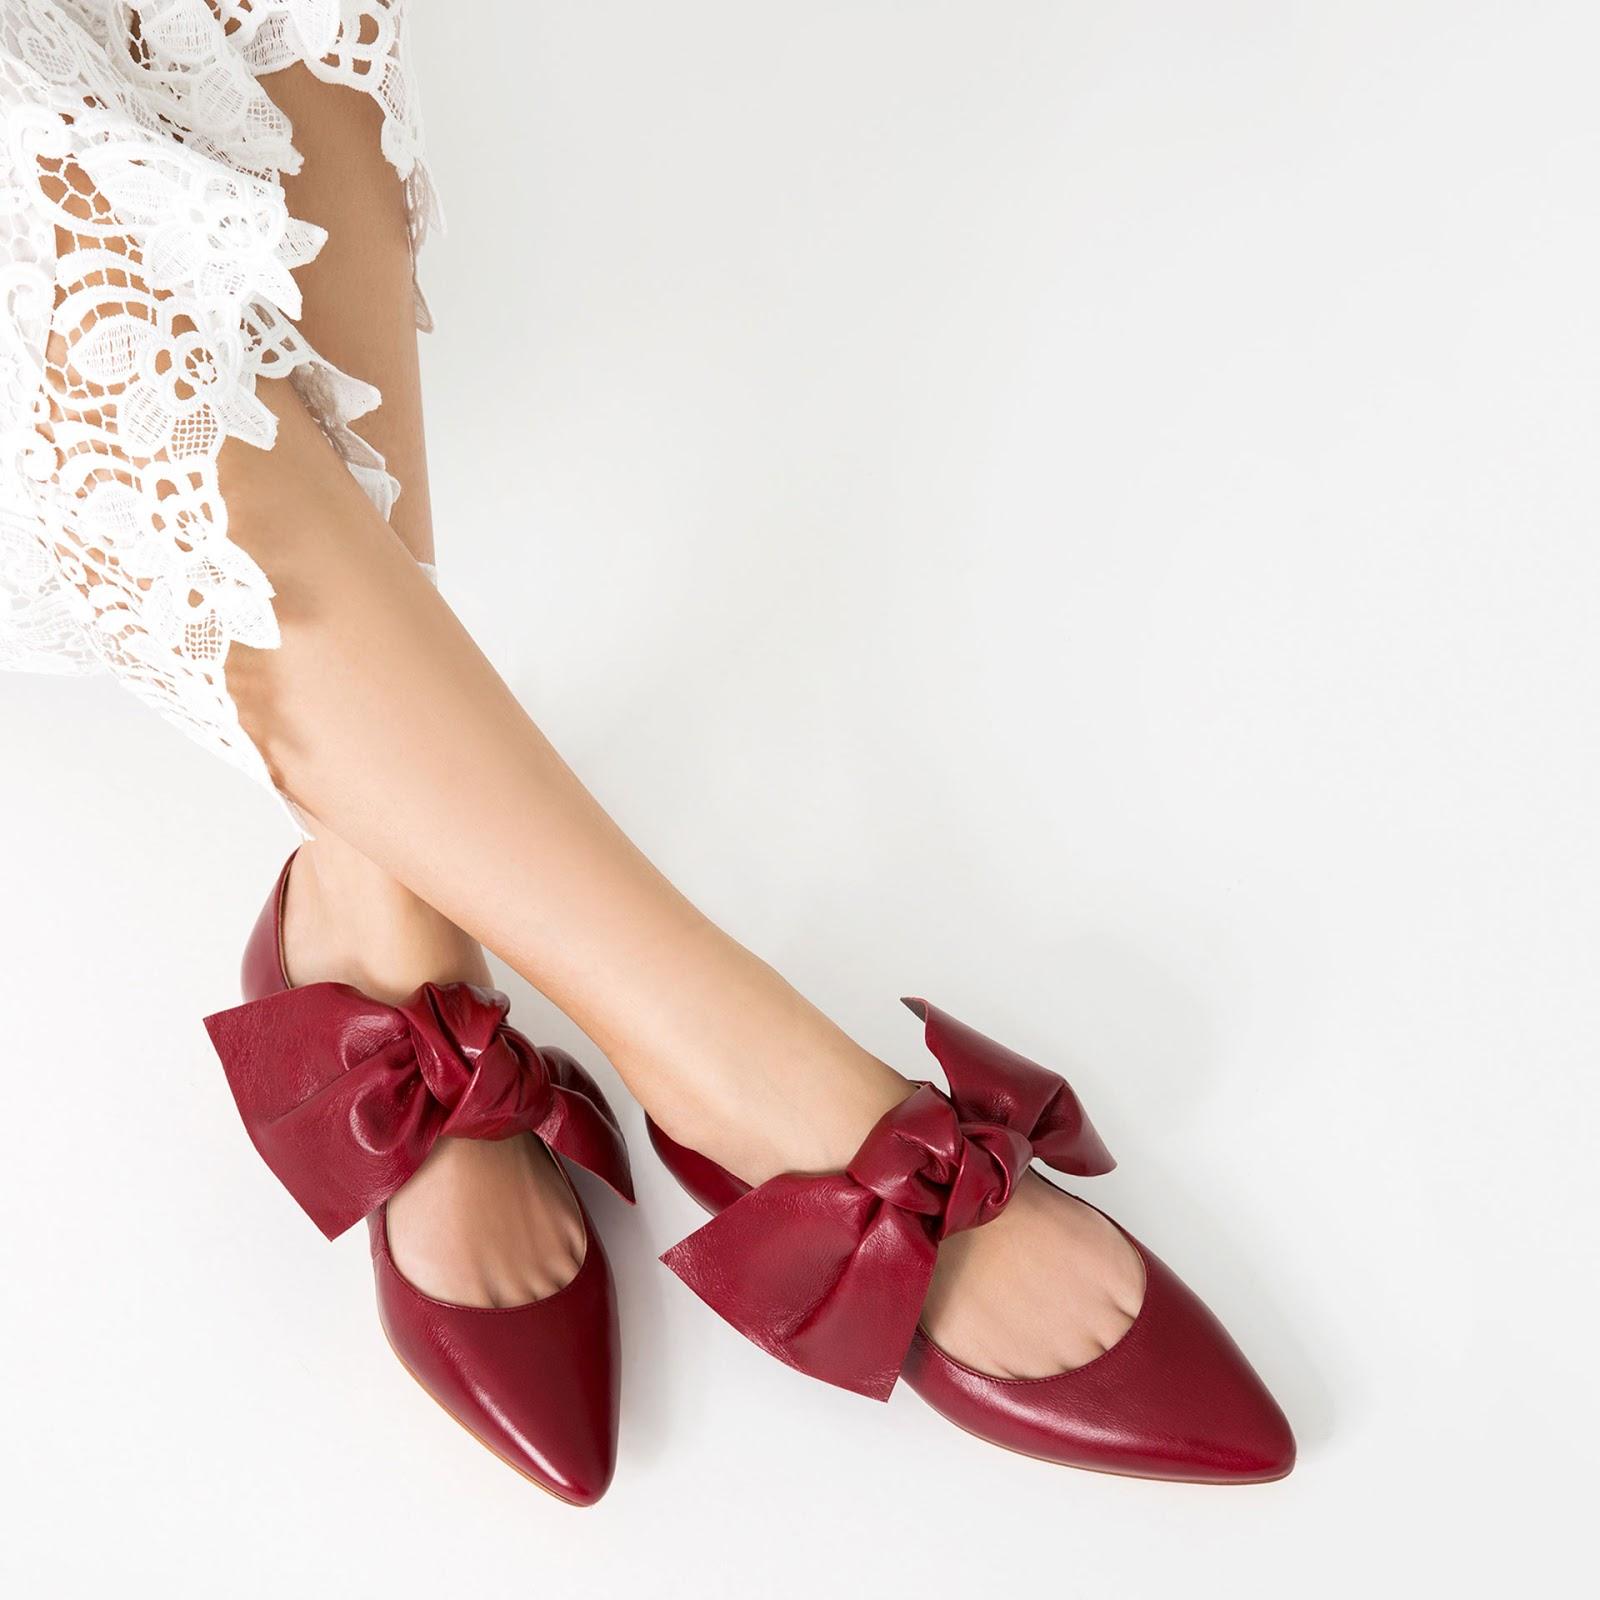 sapatos-da-zara-para-nao-passar-despercebida